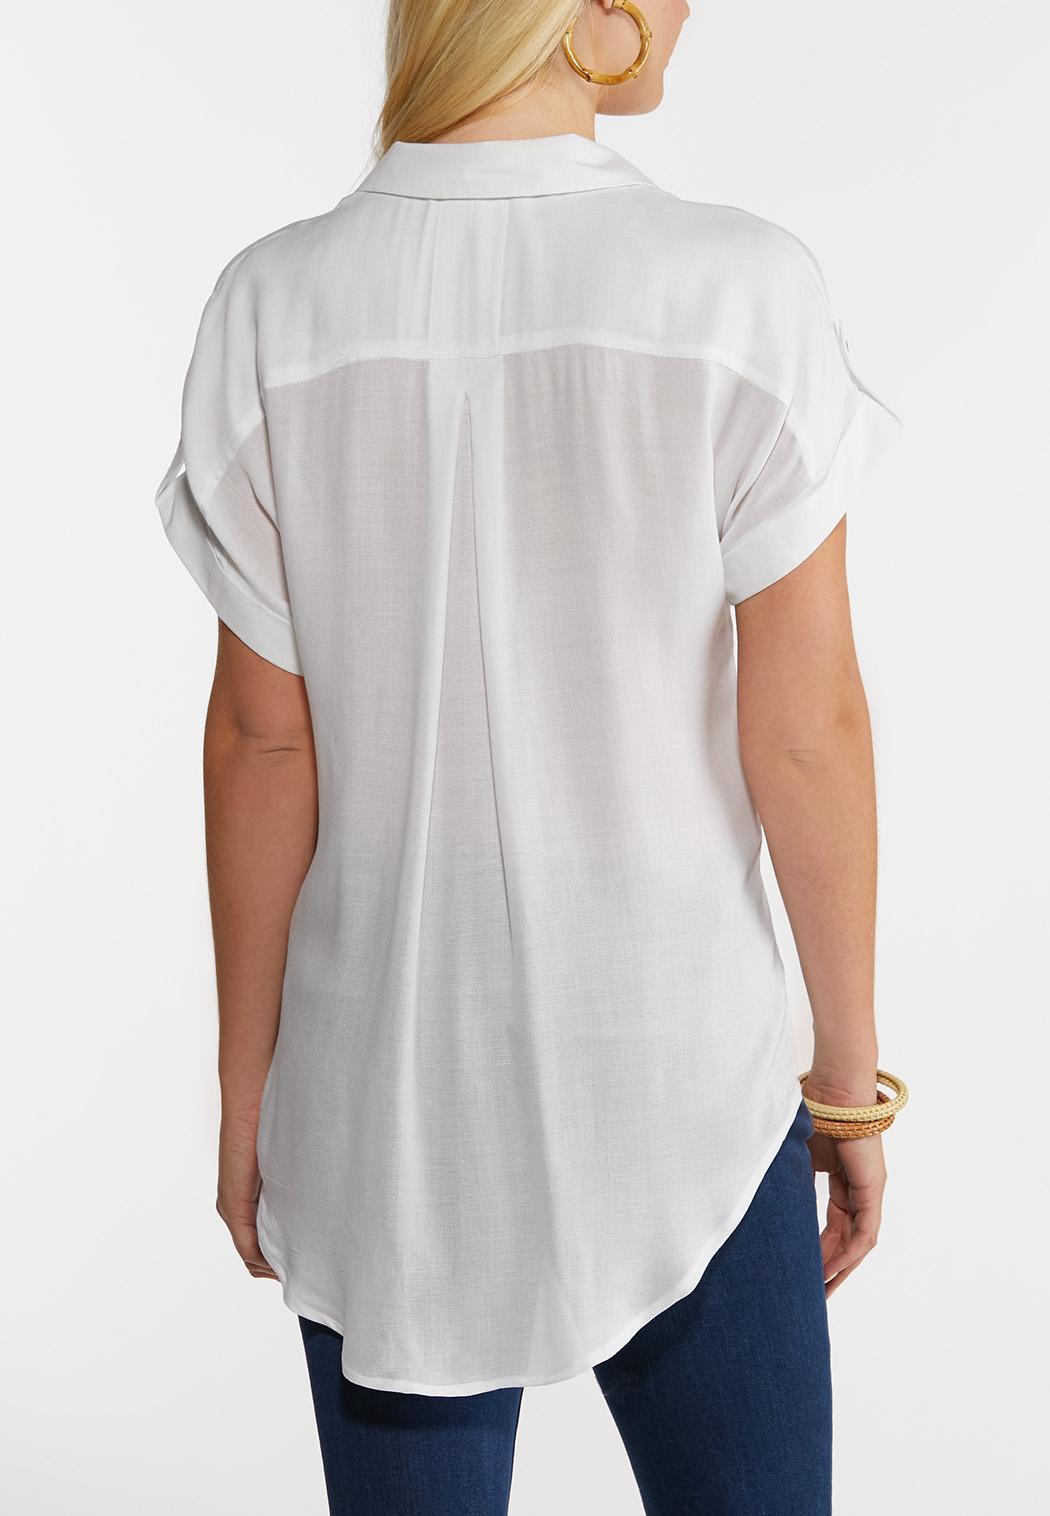 Plus Size White Crepe Button Front Shirt (Item #44510625)